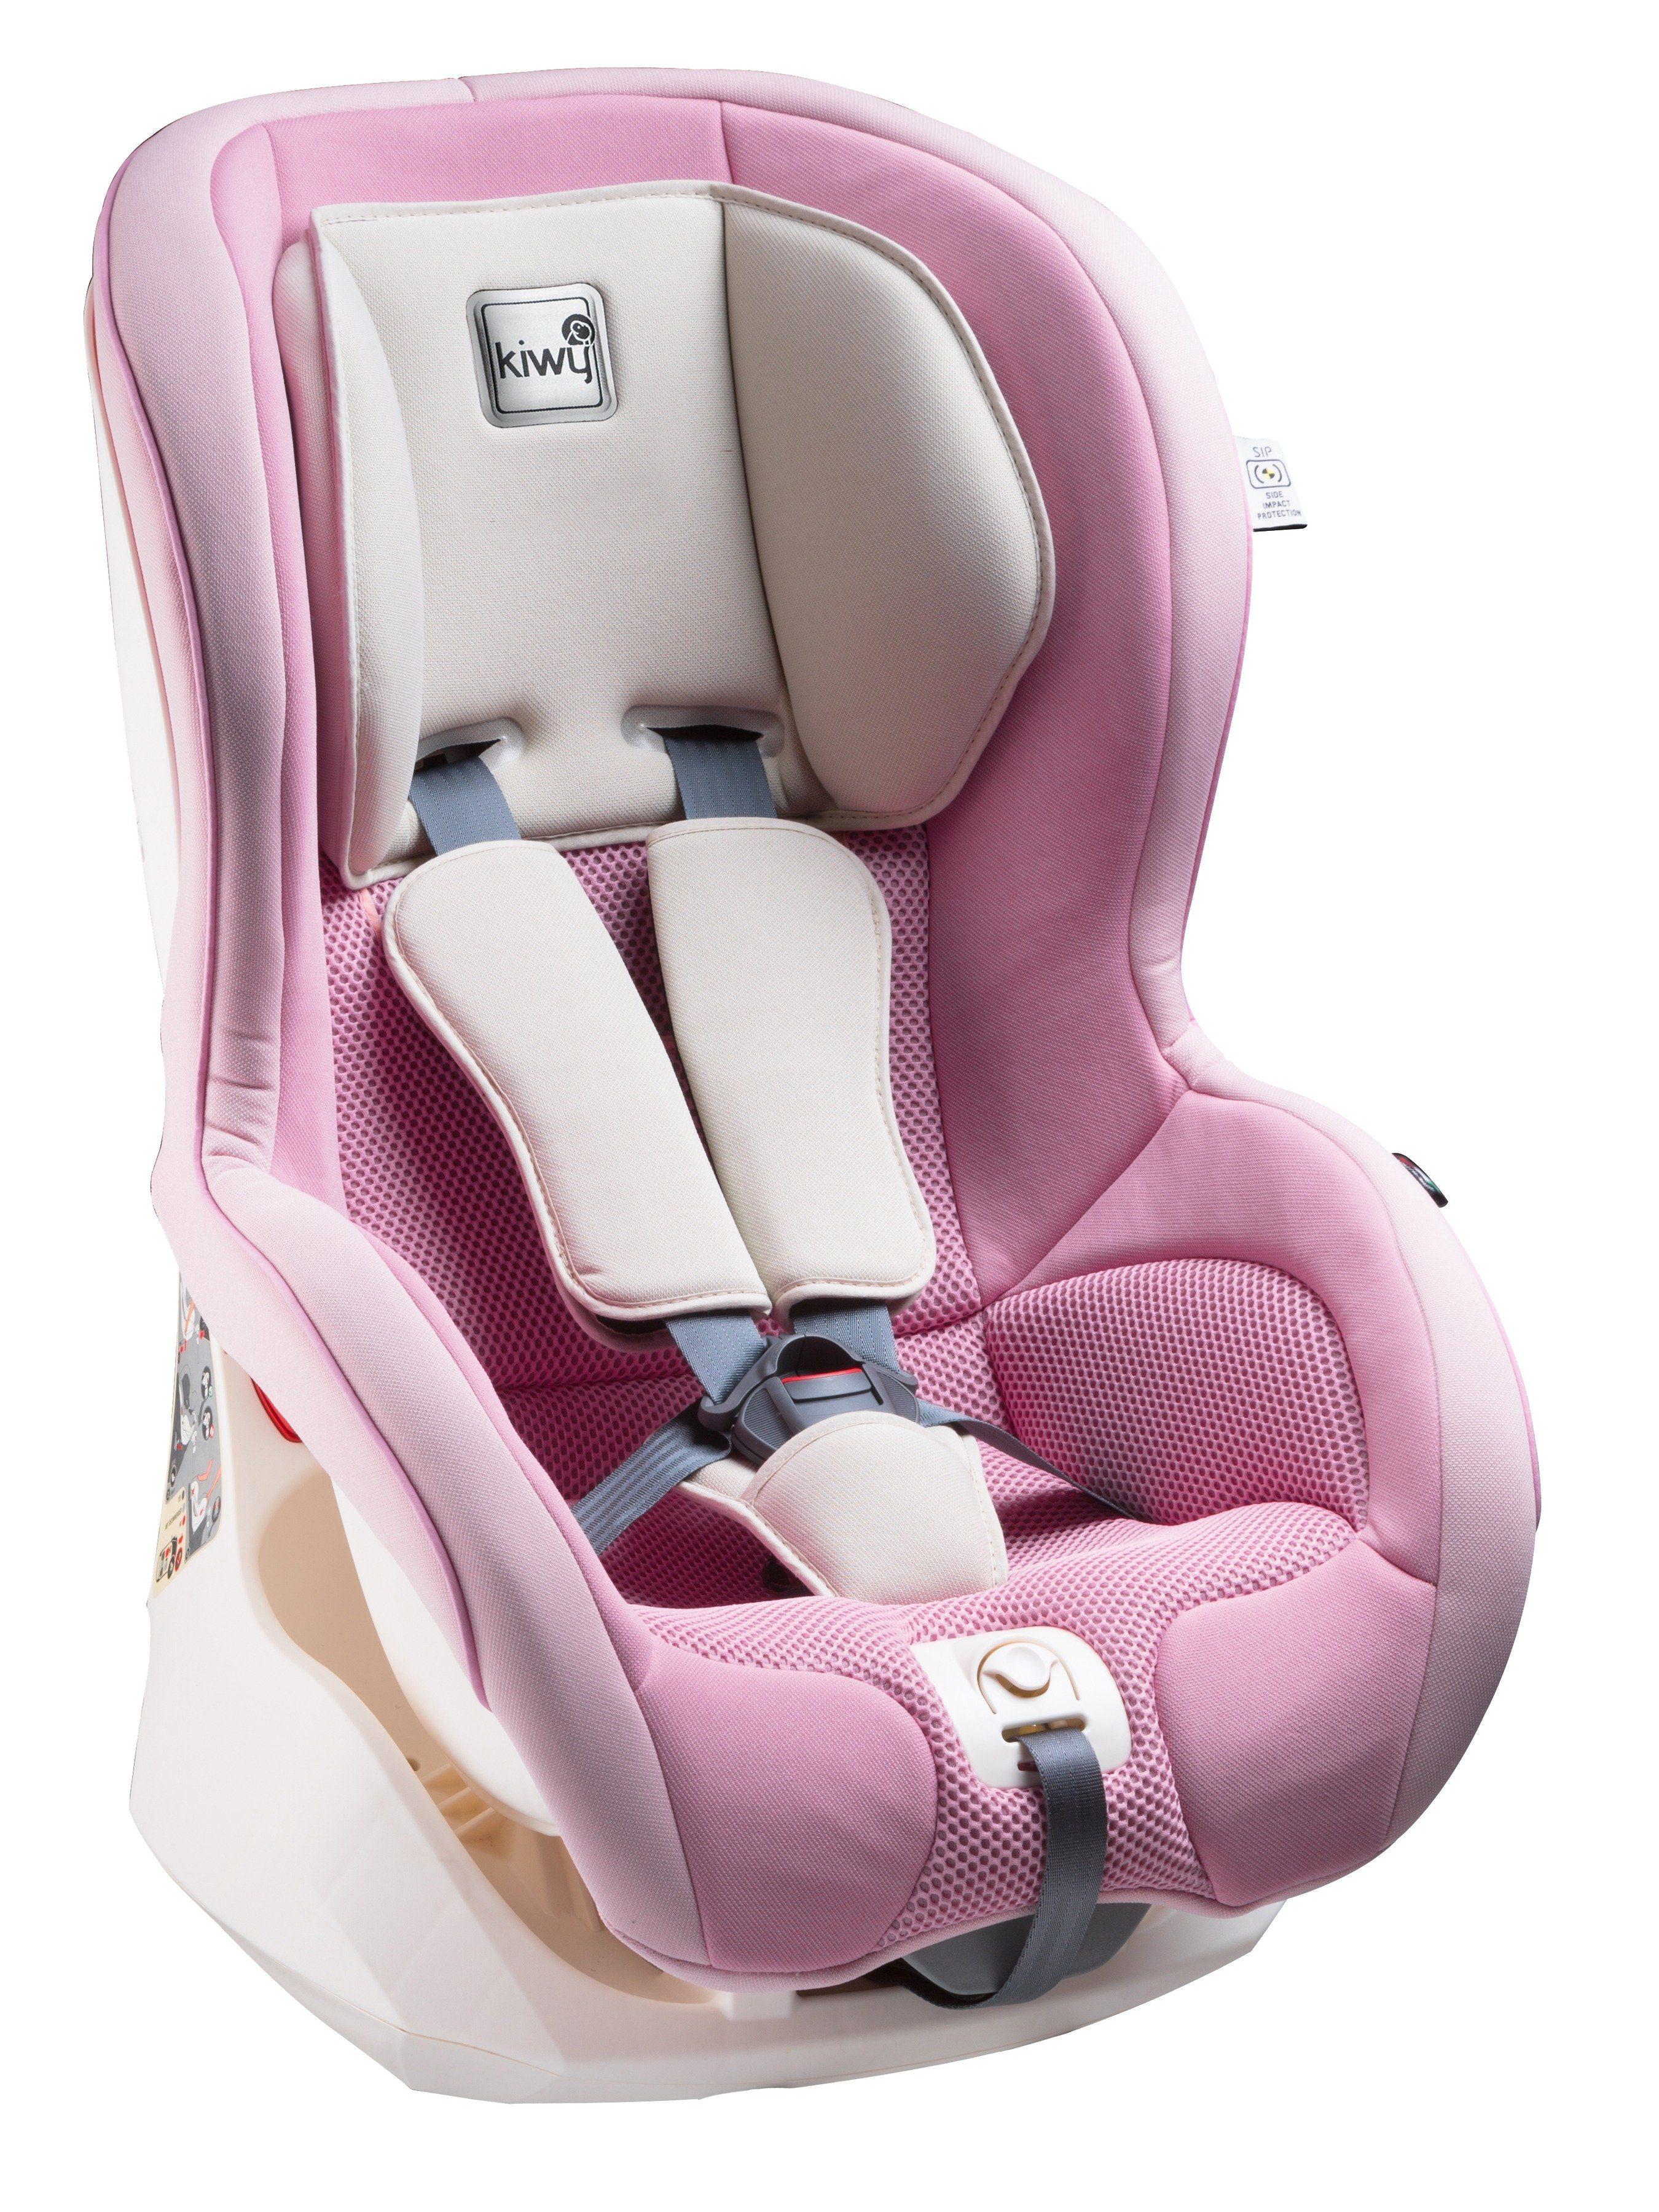 Kindersitz »kiwy SP1«